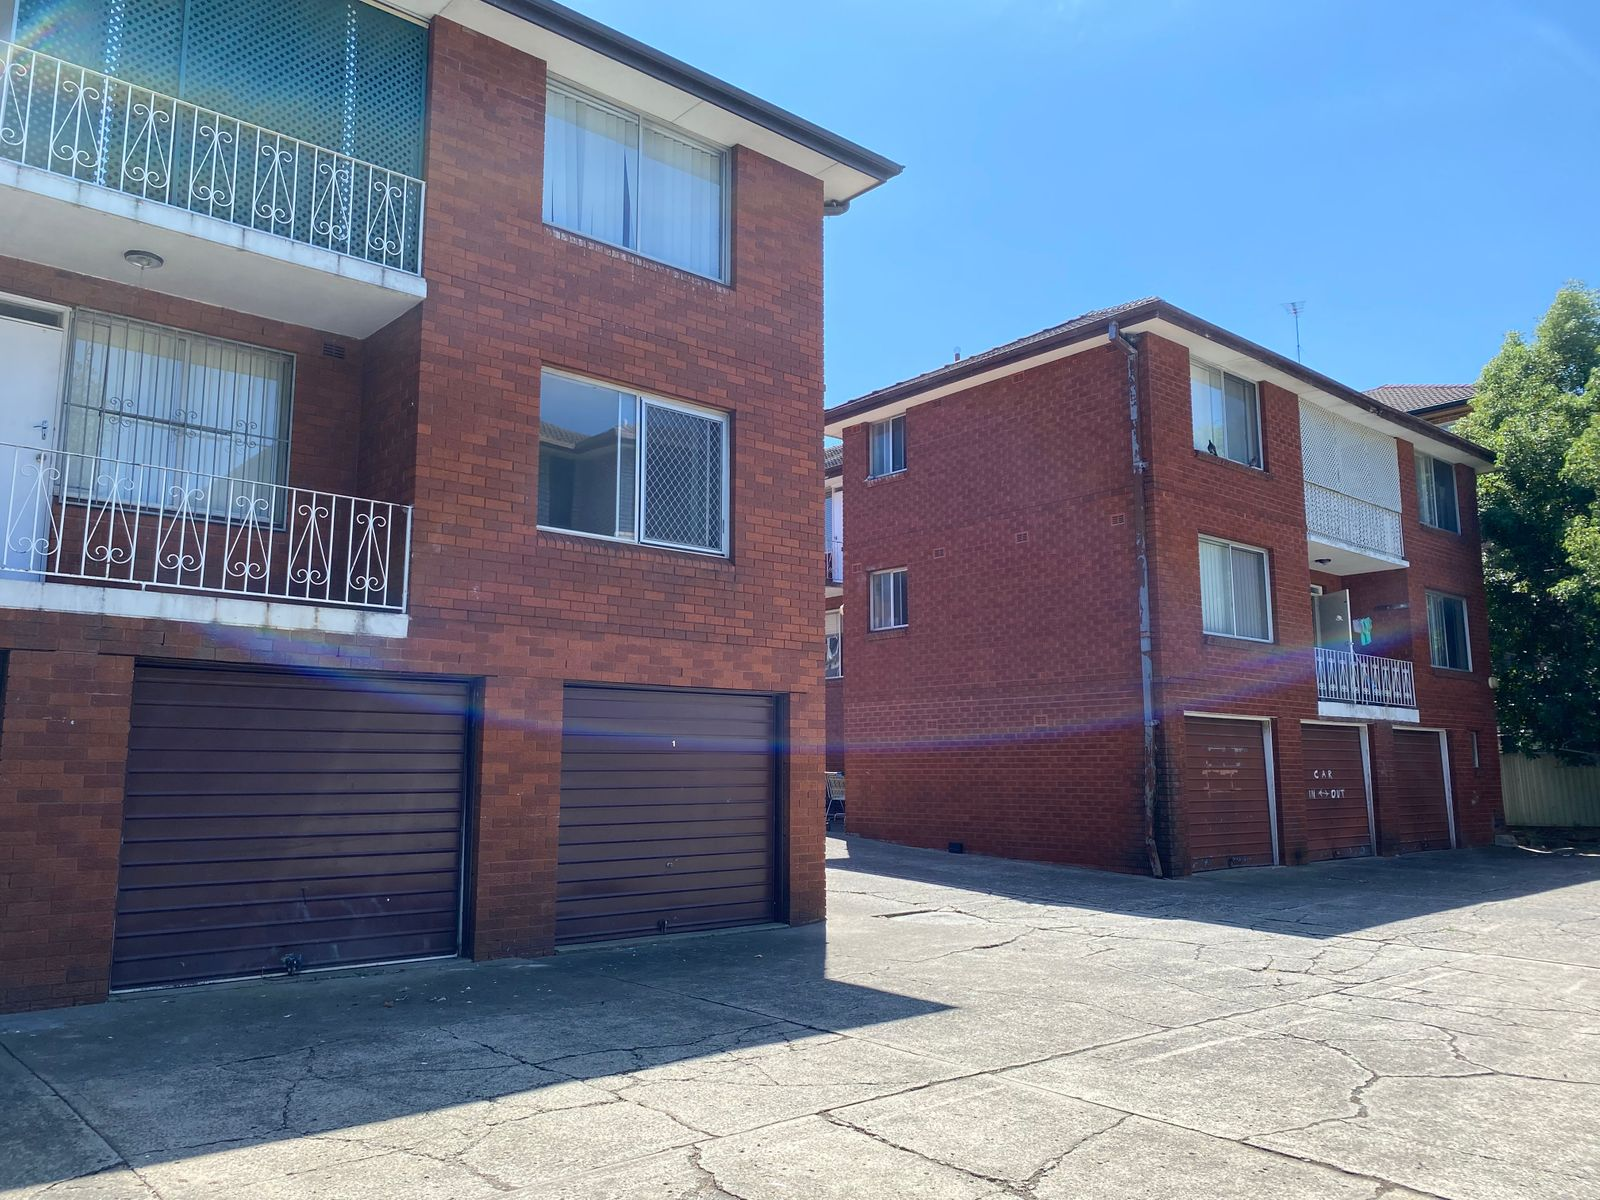 6/8 Cambridge Street, Harris Park, NSW 2150